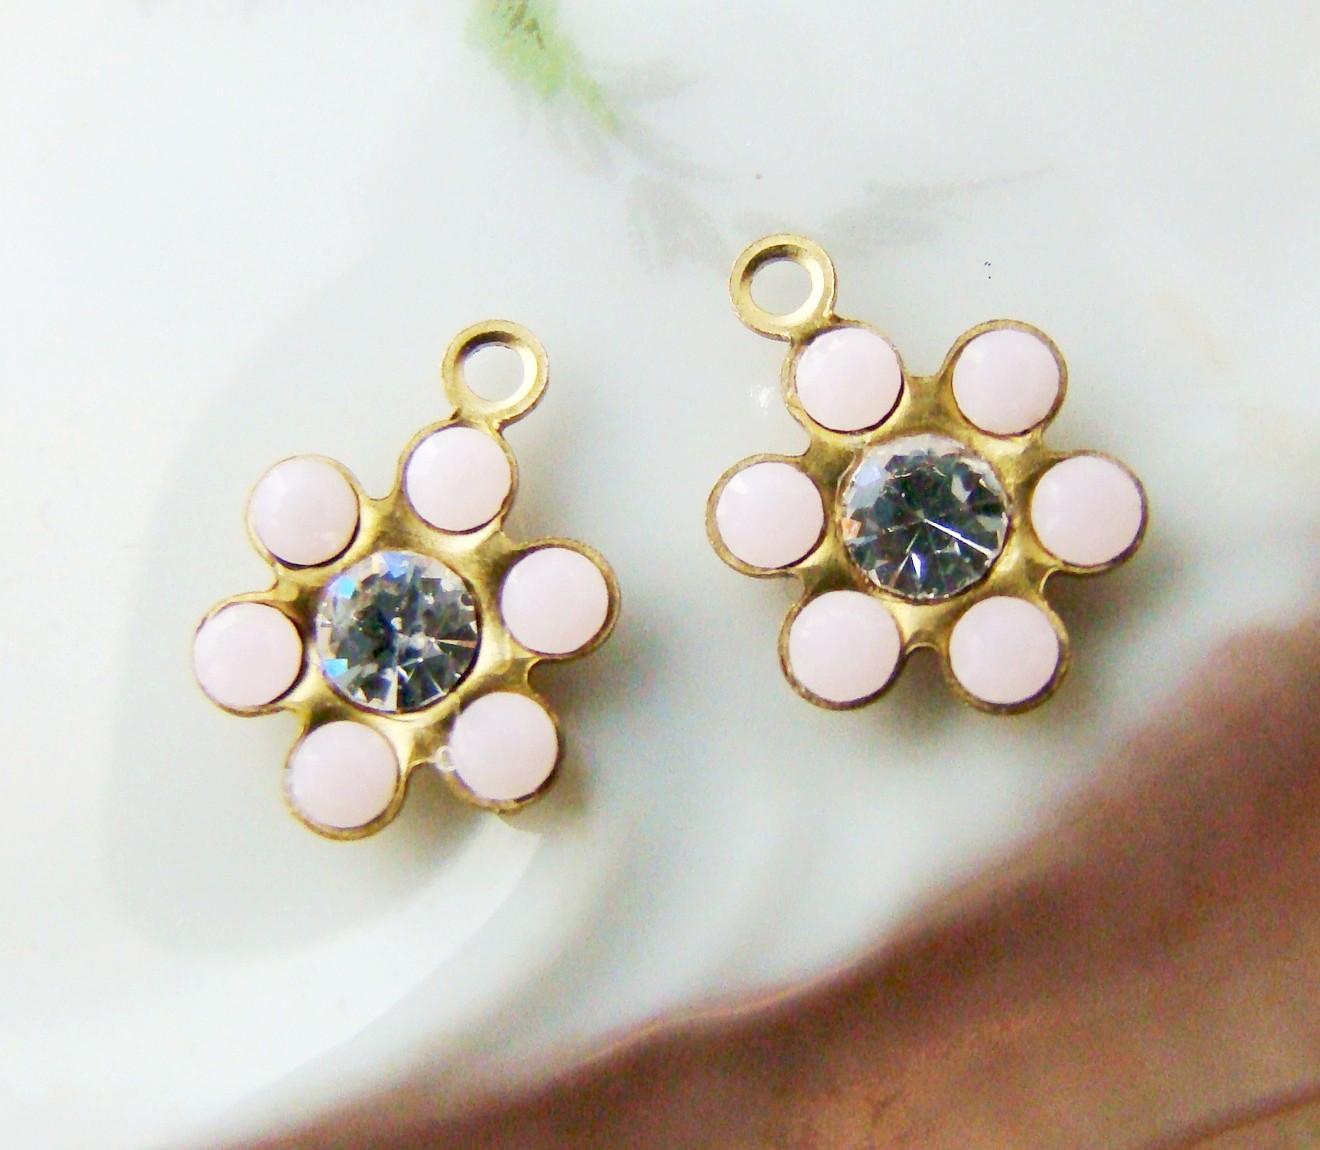 http://2.bp.blogspot.com/-Ut0kk_gRu6Y/USZCRnLQlHI/AAAAAAAABSg/VAYAySA_cZg/s1600/vintage+alabaster+pink+clear+rhinestone+Swarovski+flower+drops+brass++2.jpg